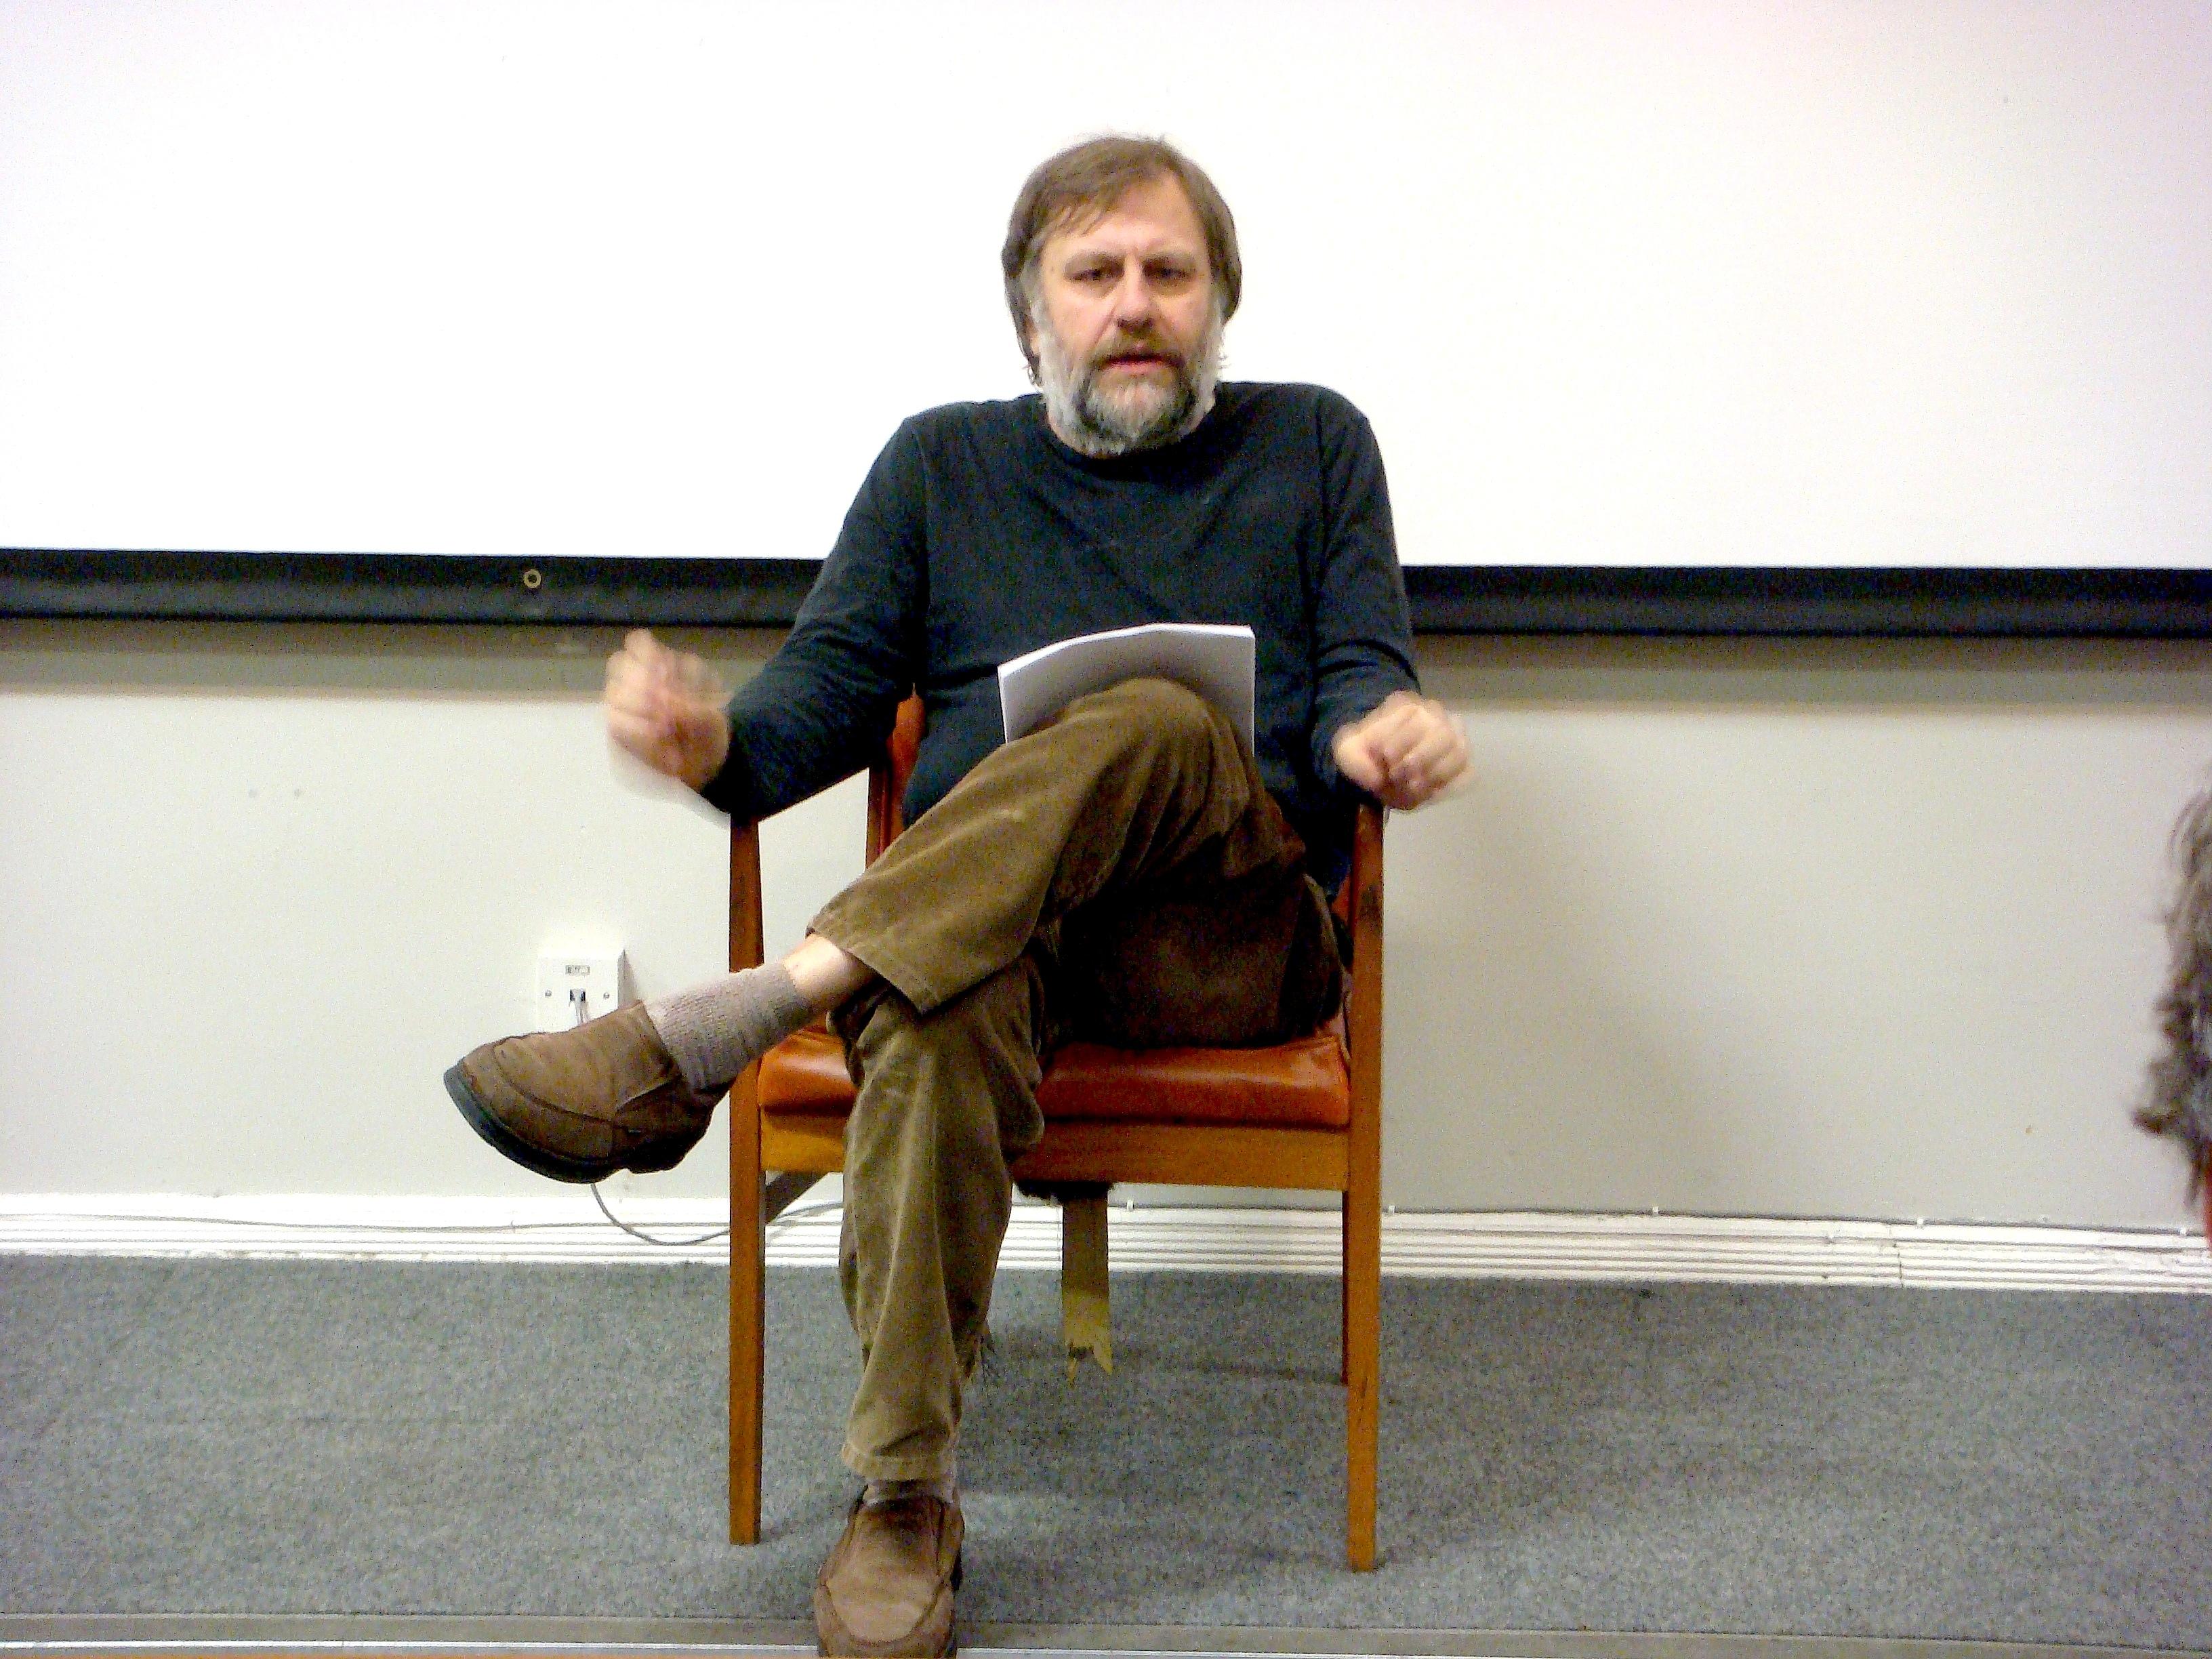 https://i0.wp.com/upload.wikimedia.org/wikipedia/commons/a/ac/Slavoj_Zizek_in_Liverpool.jpg